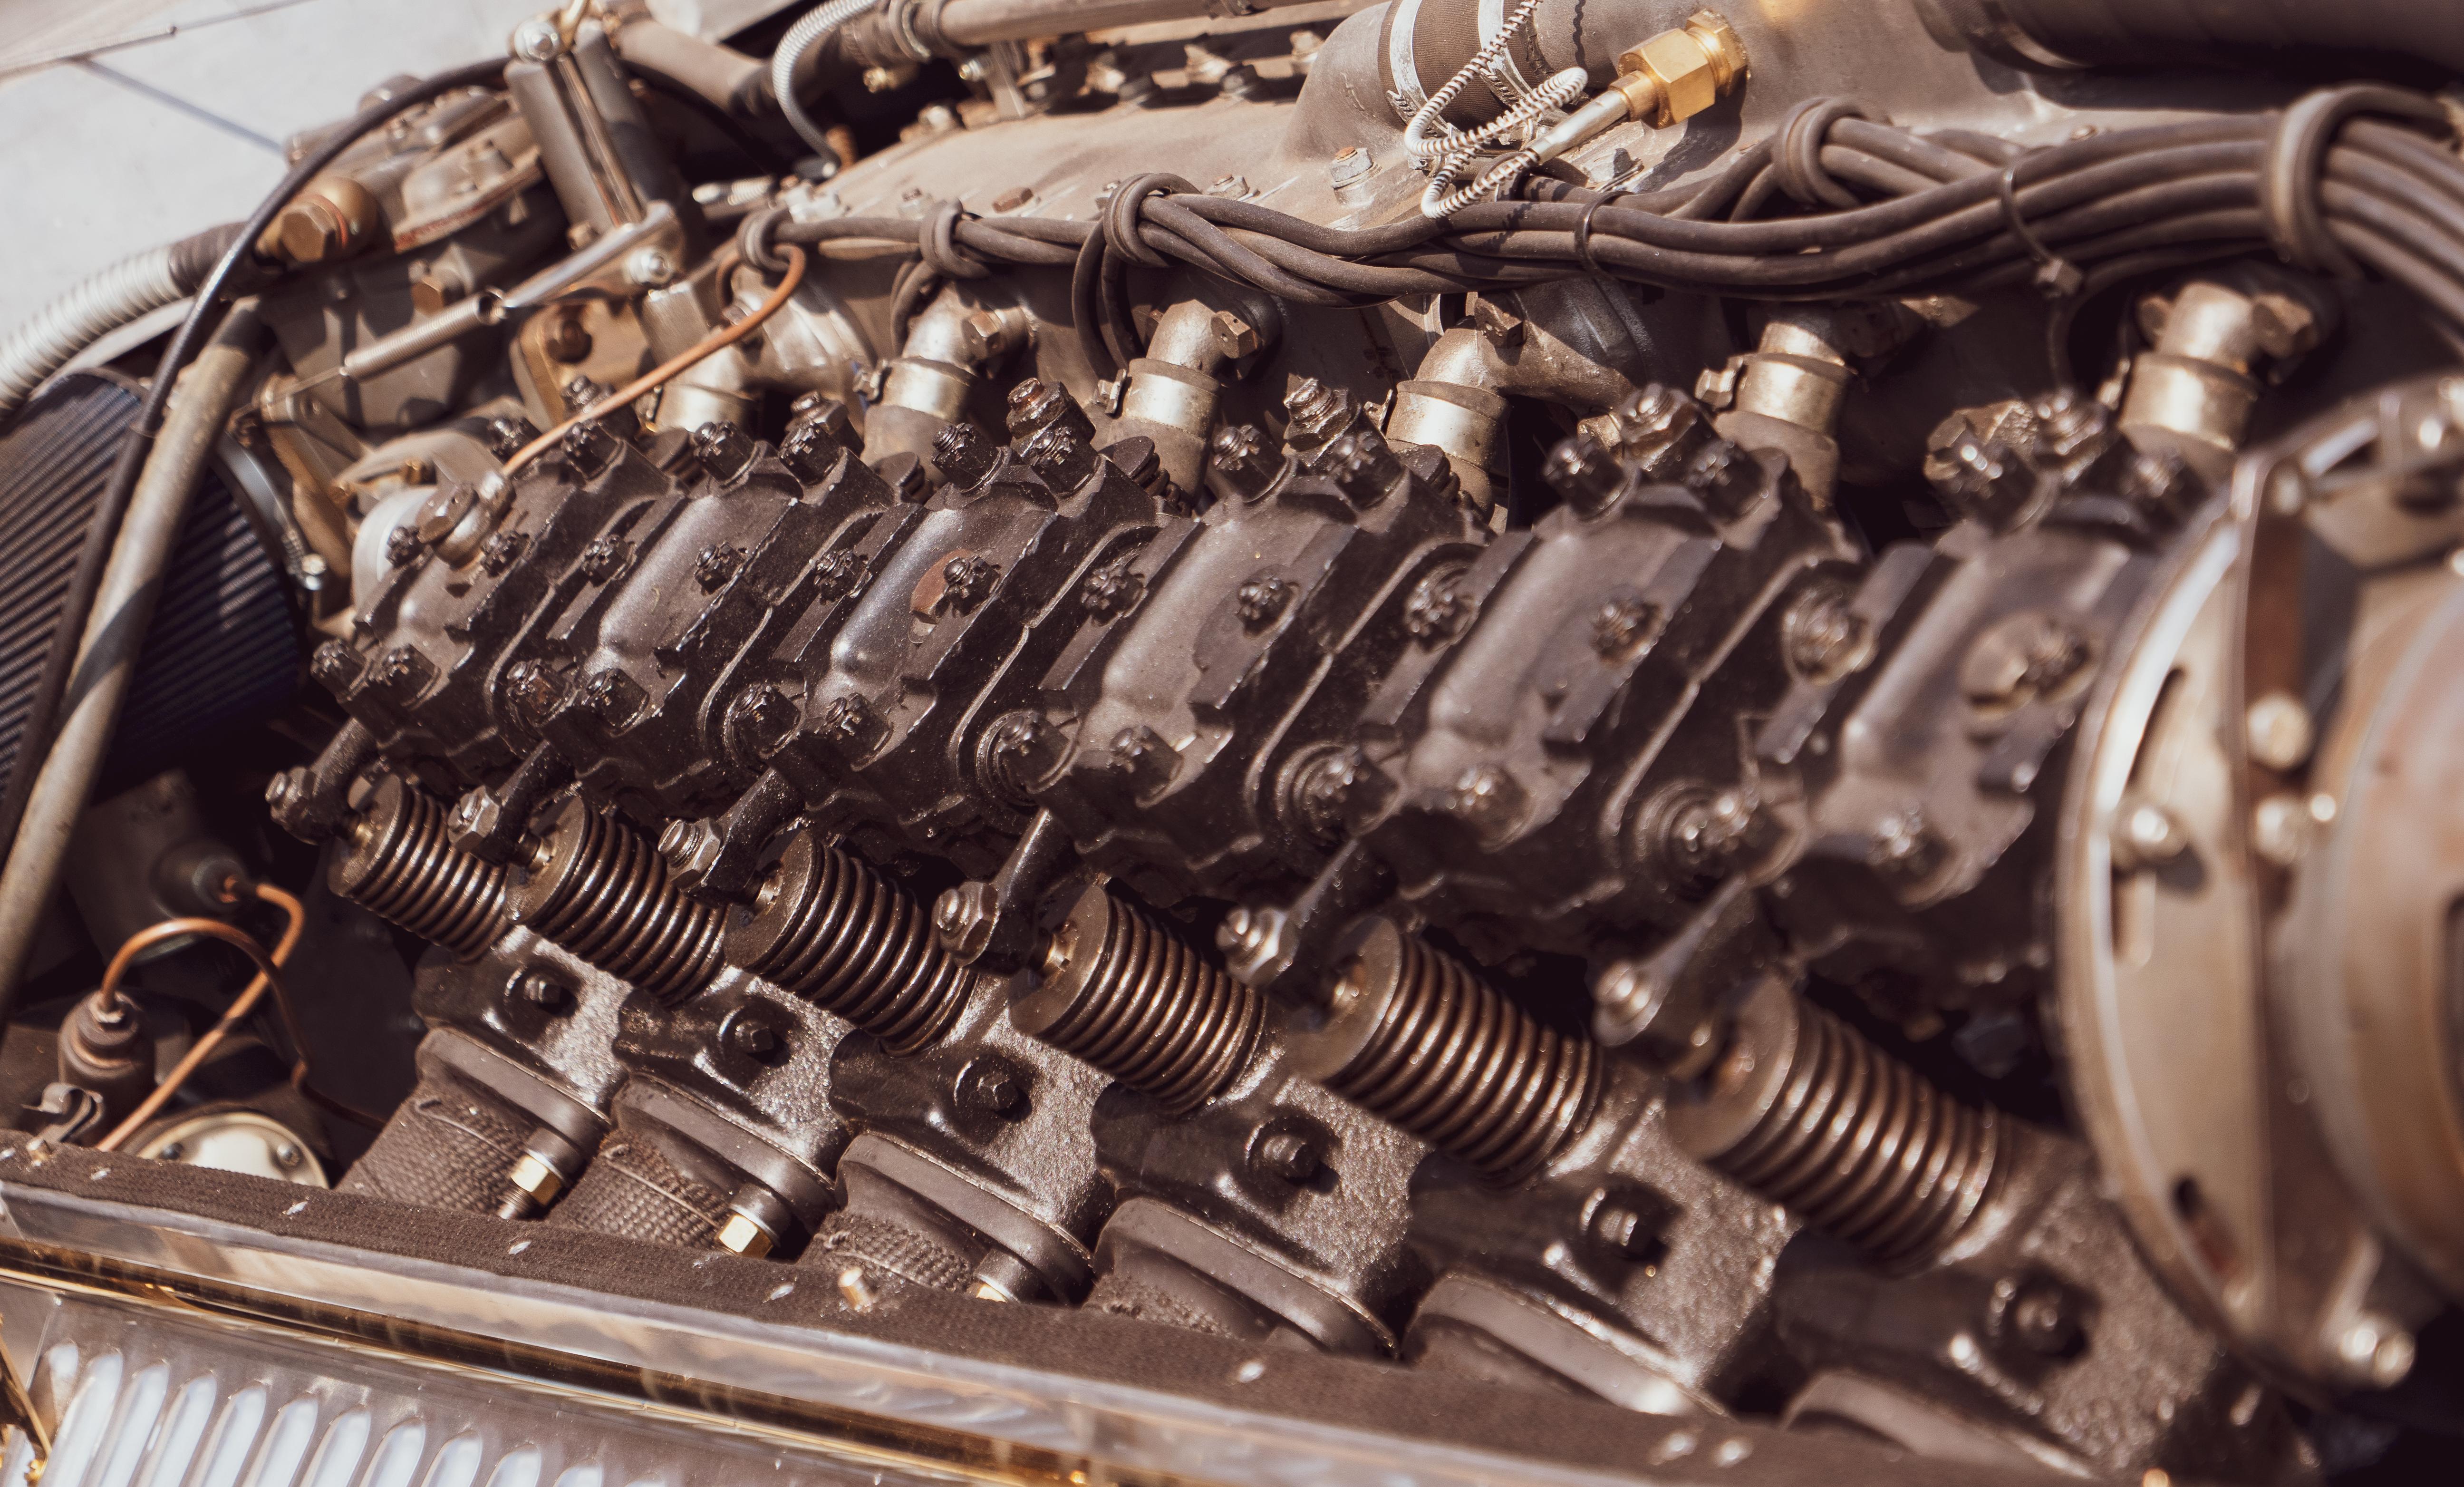 Minerva Libert Special 27 litre V12 engine